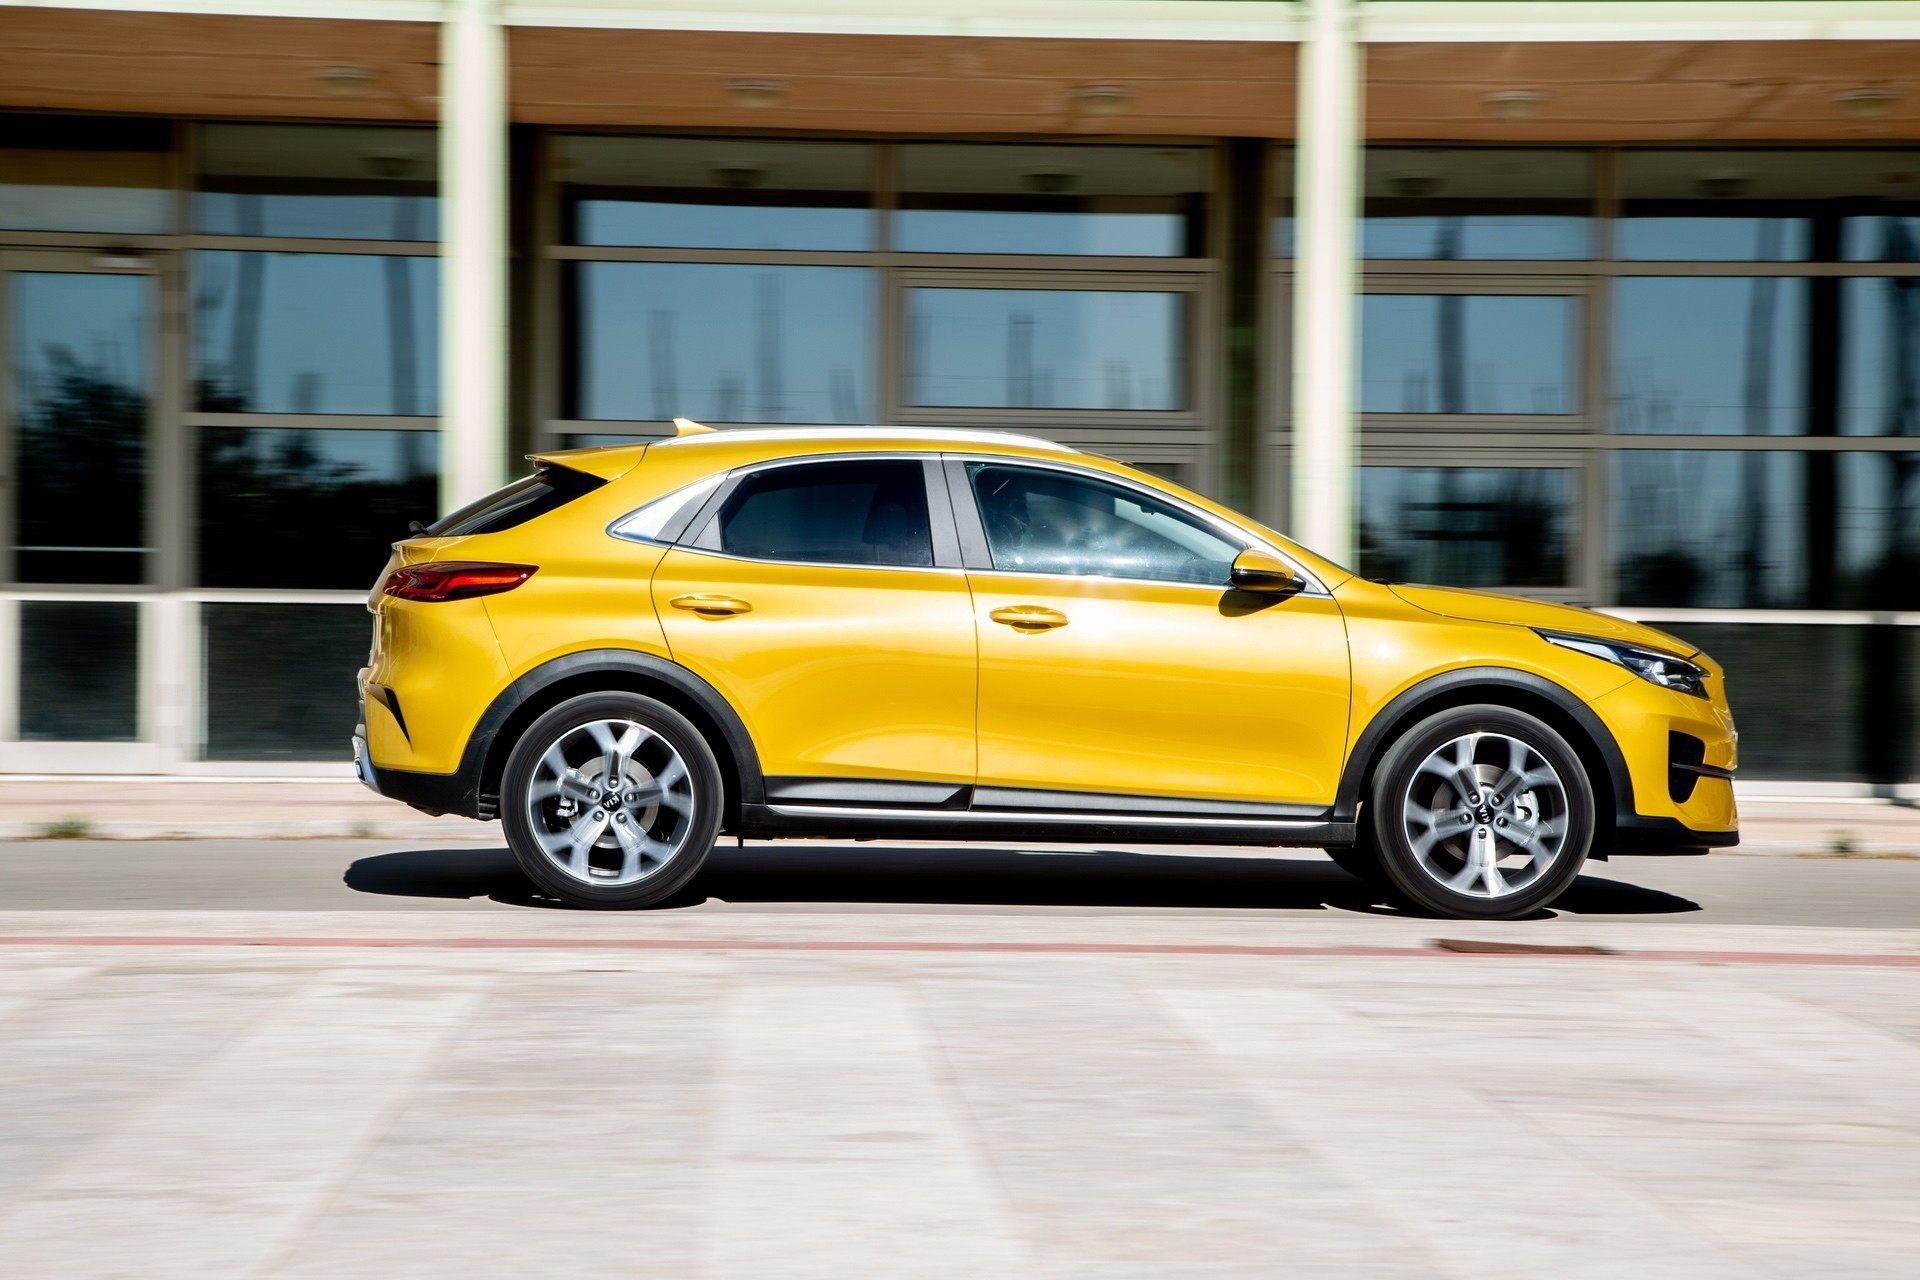 First_Drive_Renault_Captur_0010